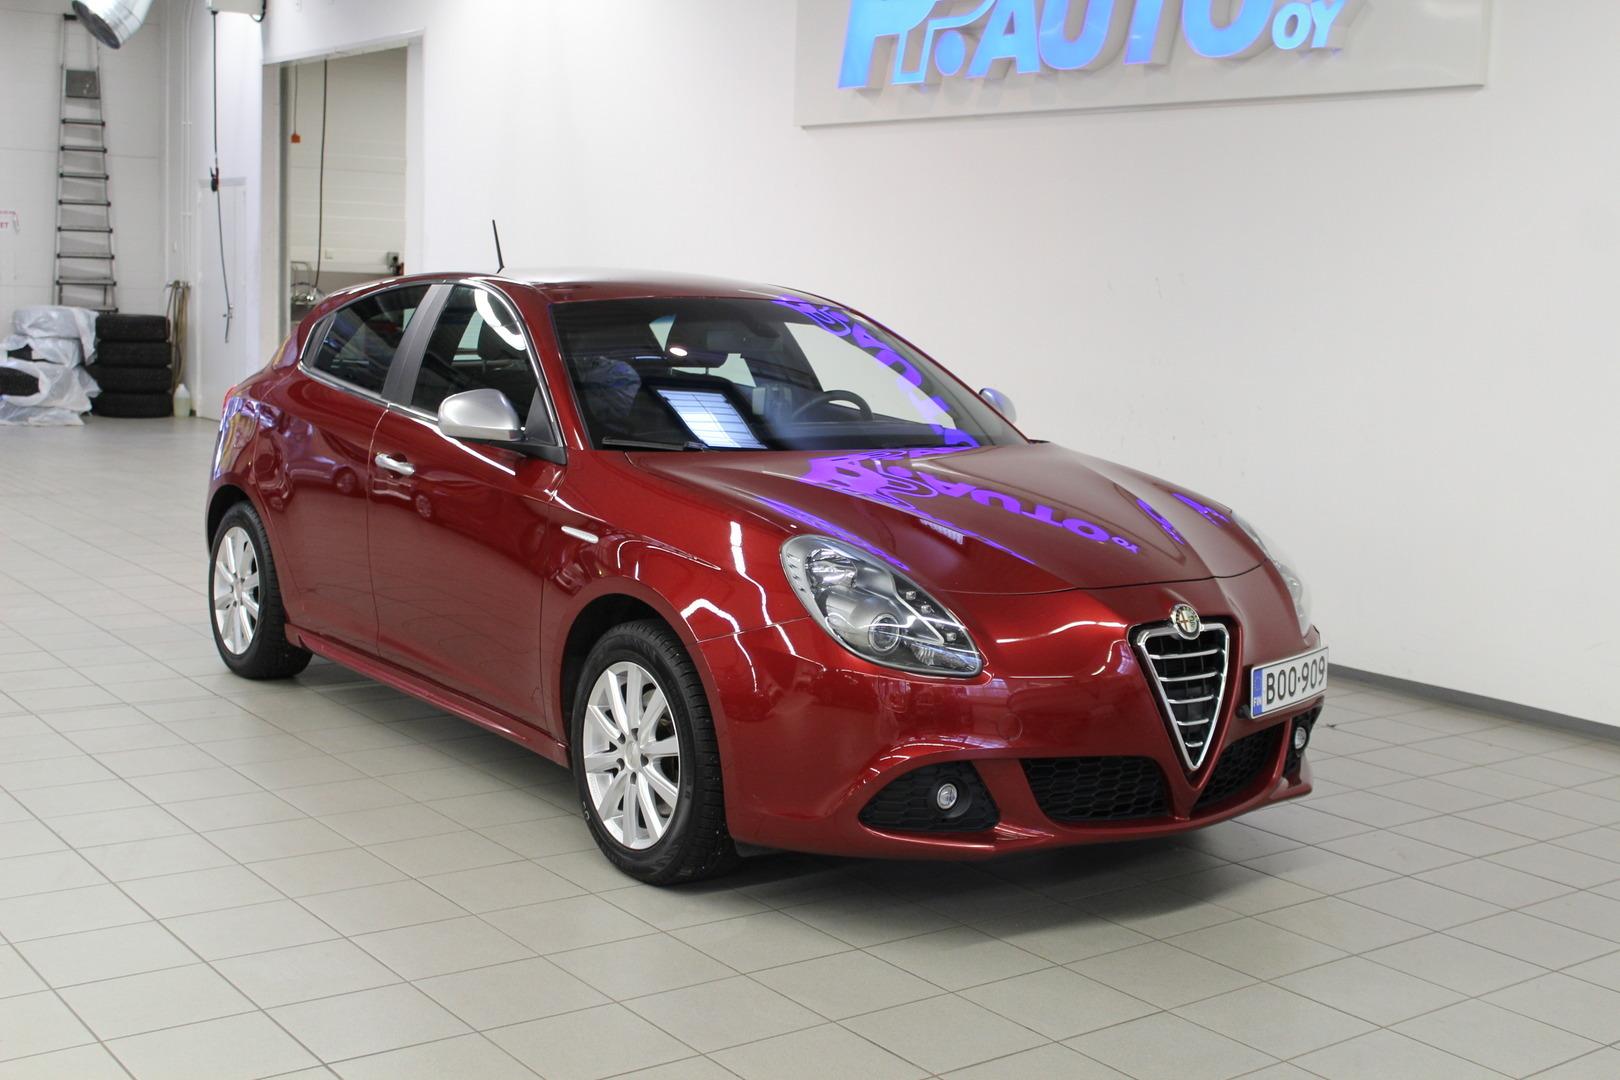 Alfa Romeo Giulietta >> Vaihtoautot Alfa Romeo Giulietta 1 4 Multiair 170hv Bensiini